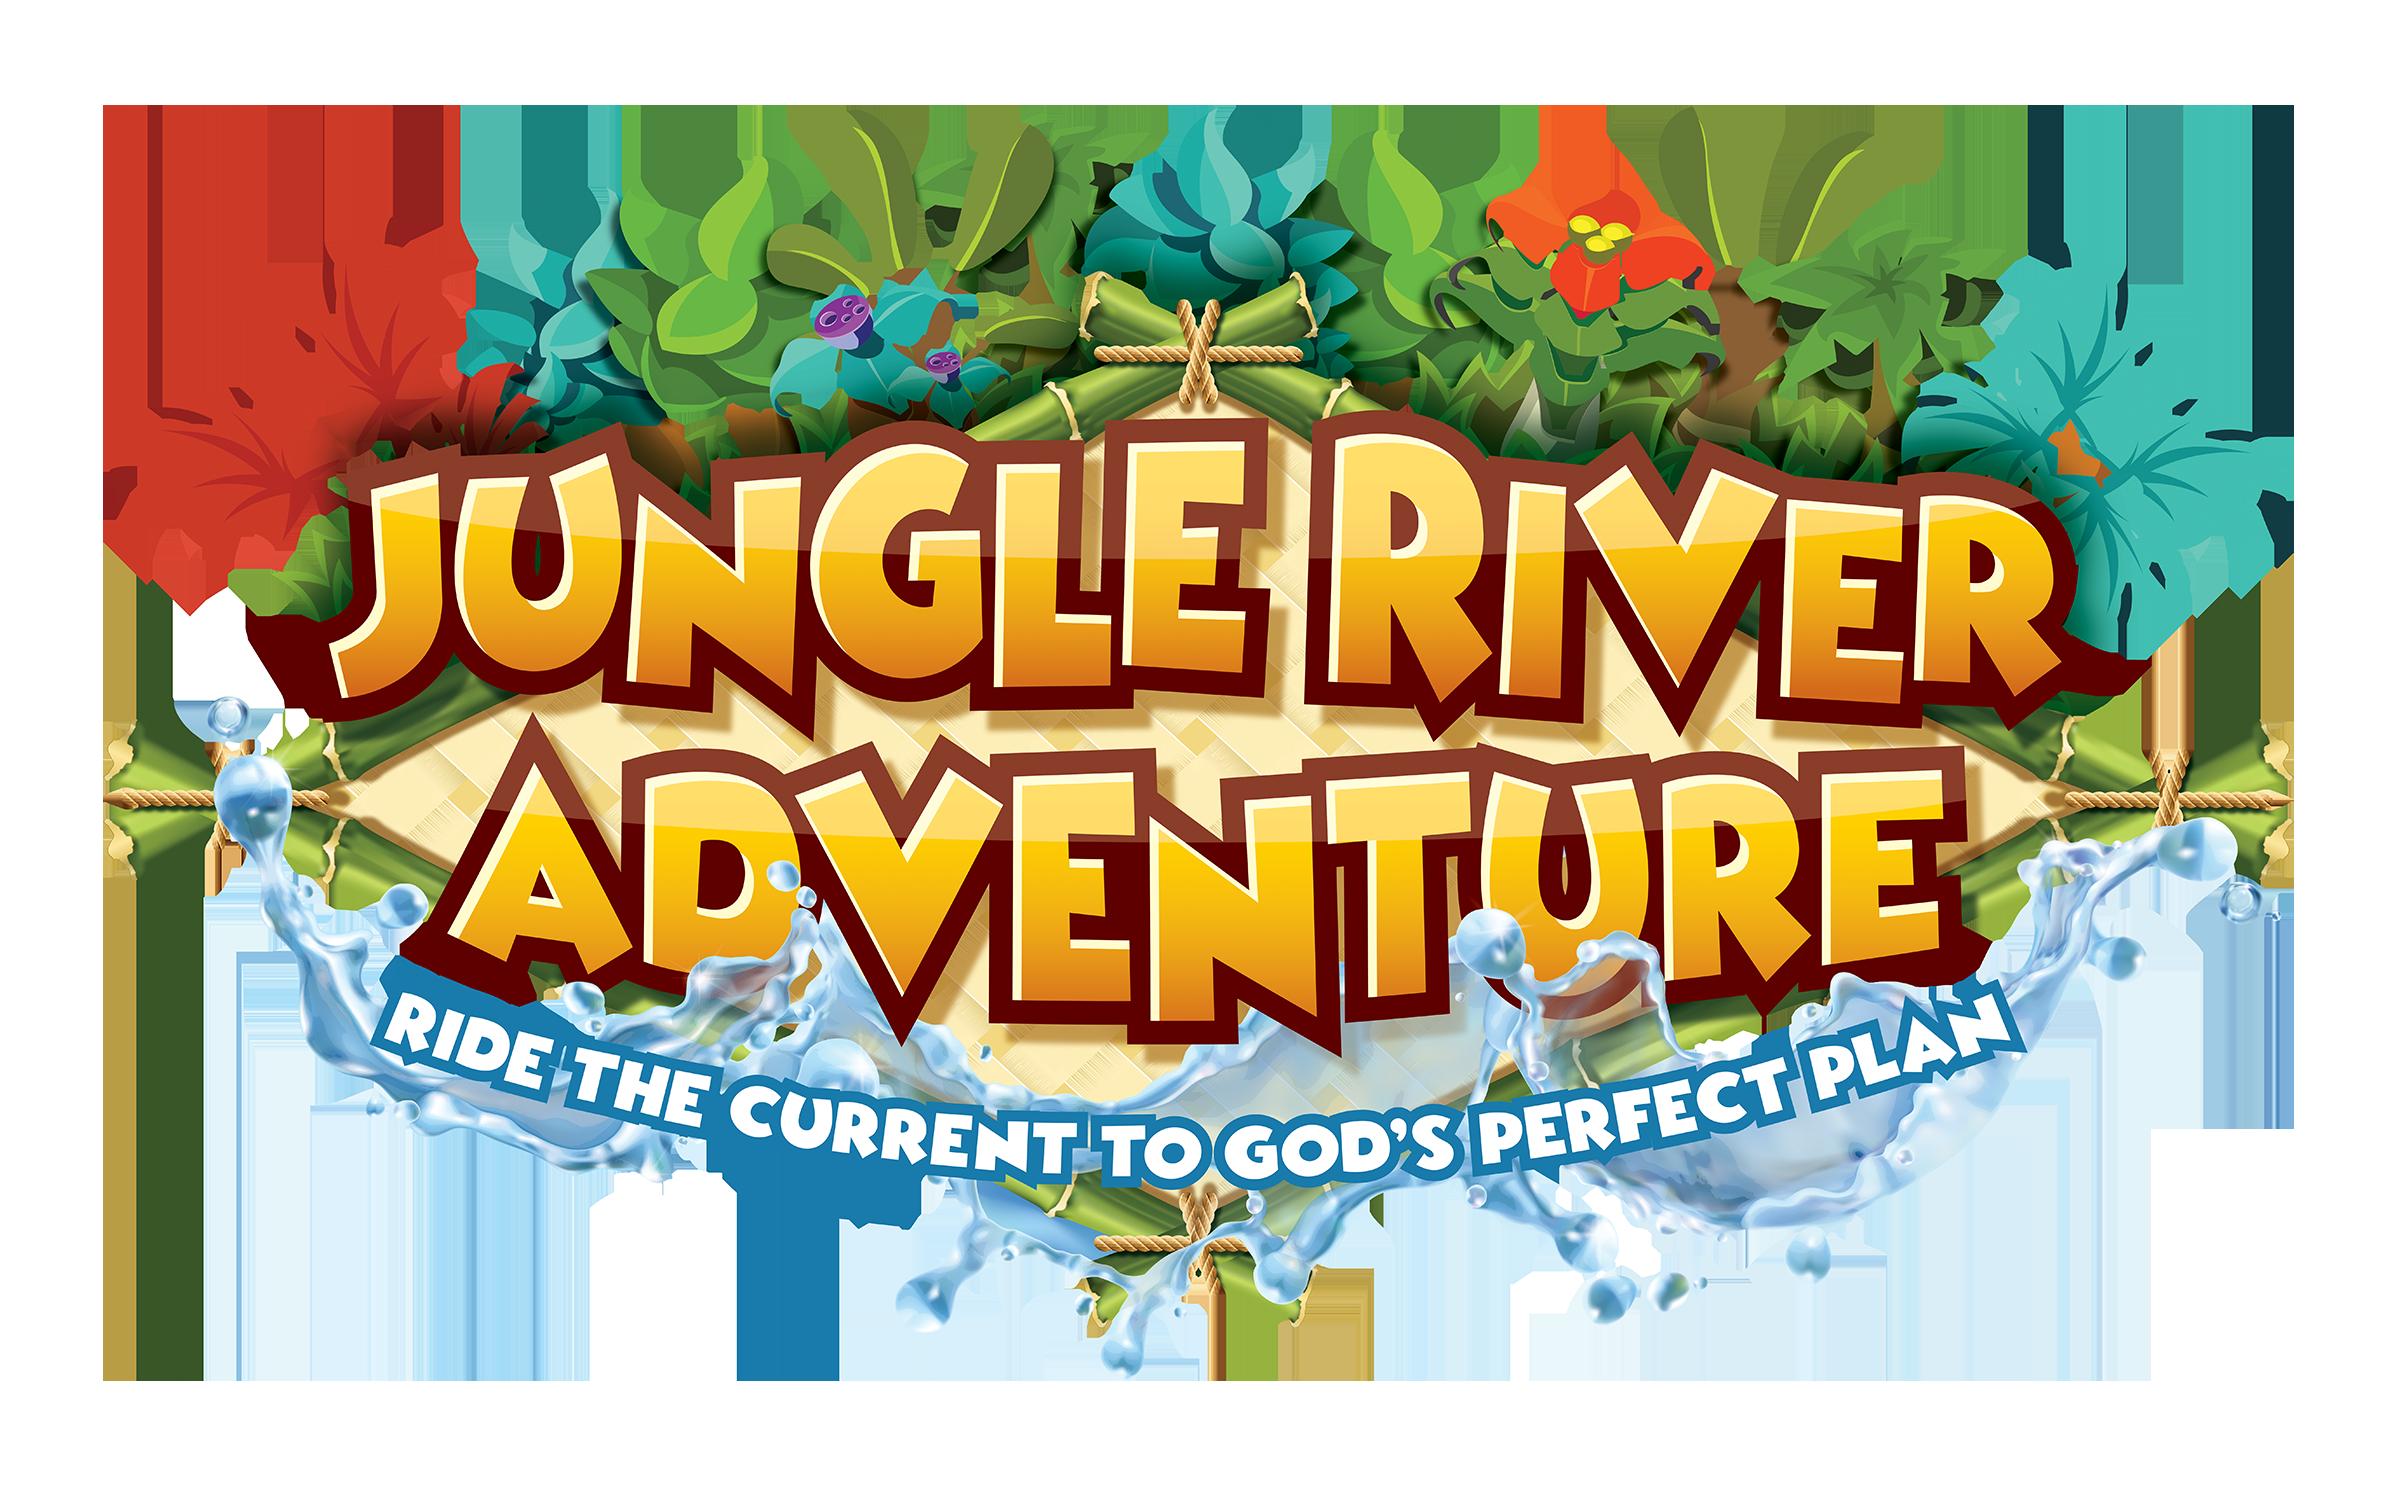 Vbs jungle river adventure. Youtube clipart ocean